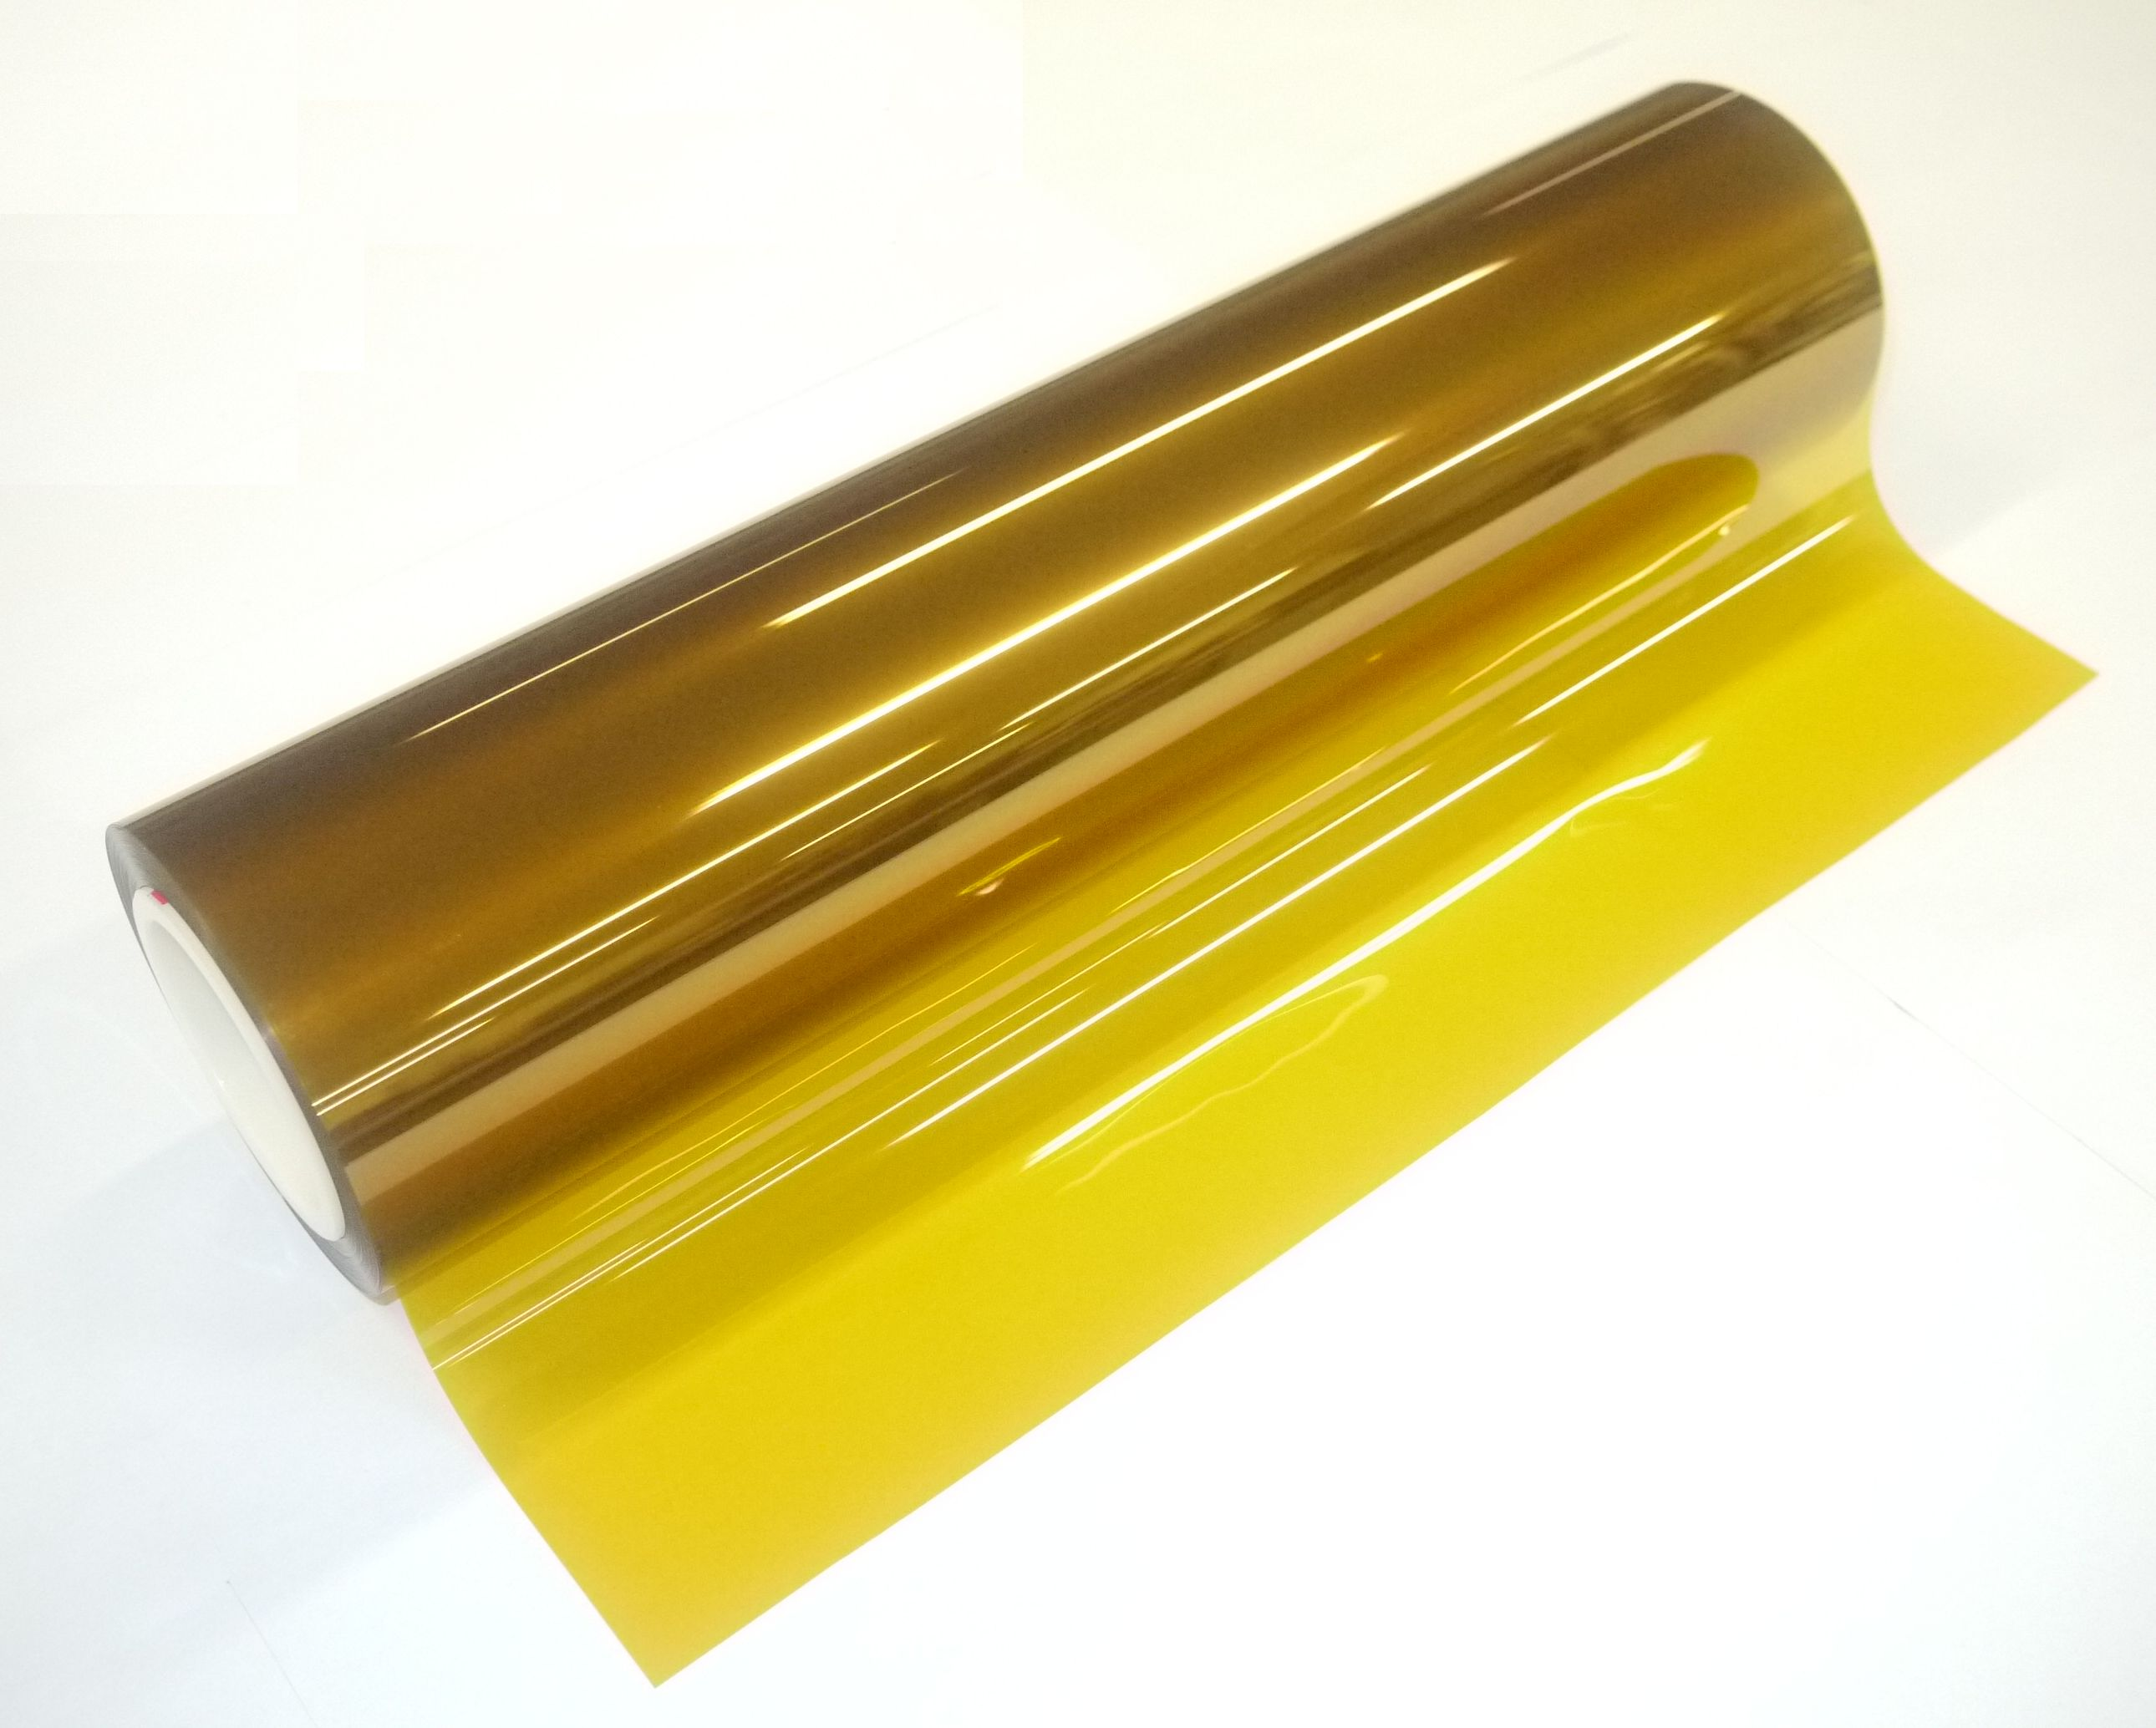 Kaneka Developed Super Heat-Resistant Polyimide Film for 5G Applications |  KANEKA CORPORATION